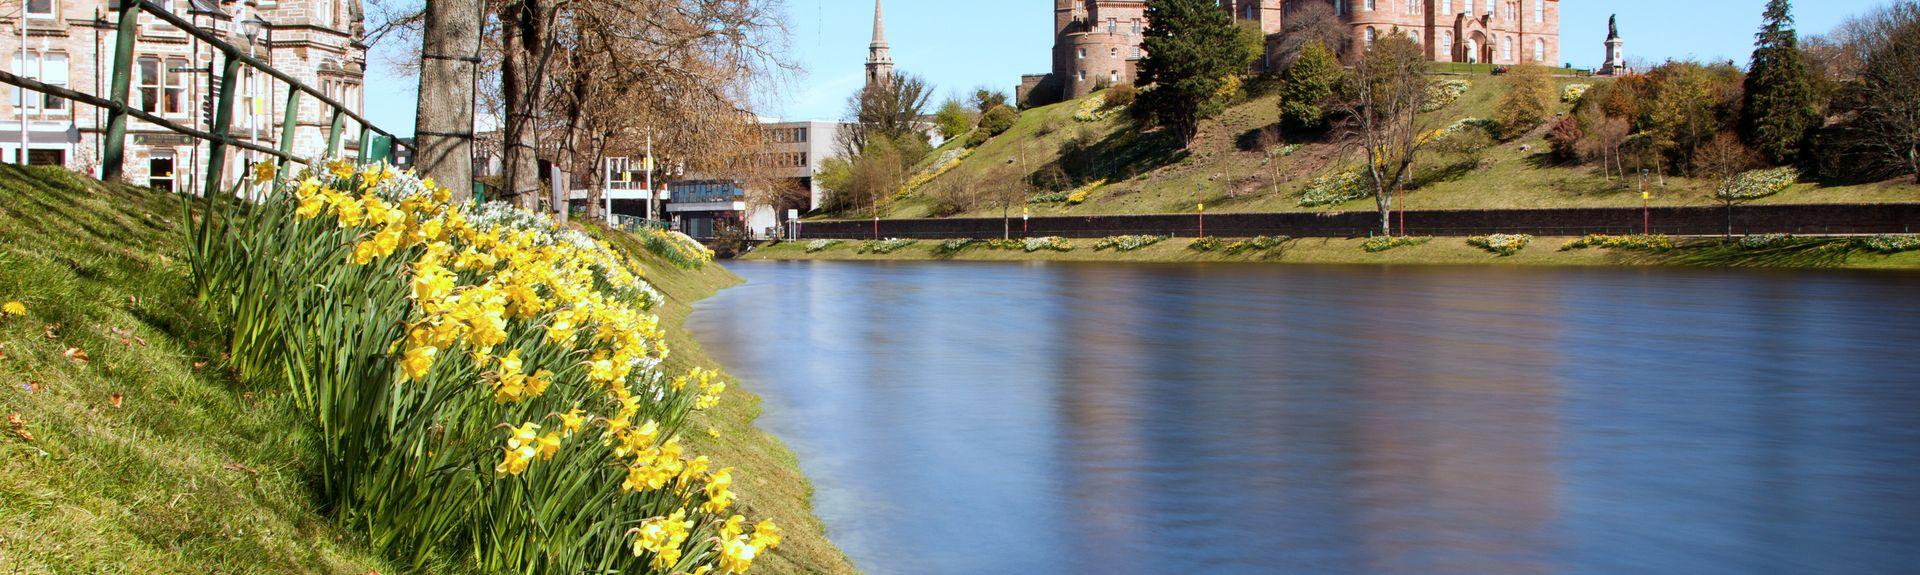 Inverness, Scotland, United Kingdom